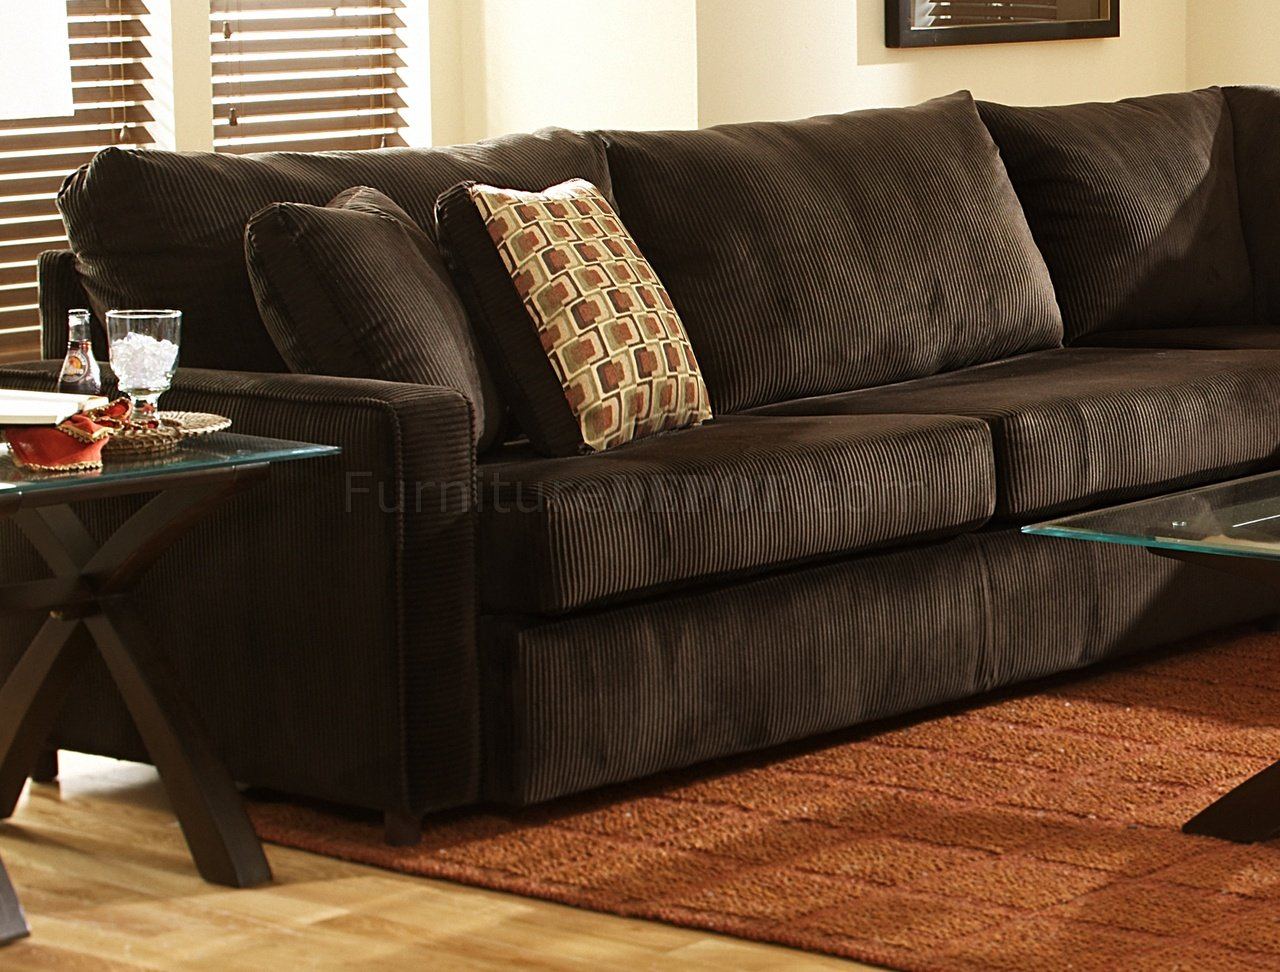 sofa back pillows extra large dog bed uk viva chocolate fabric modern sectional w